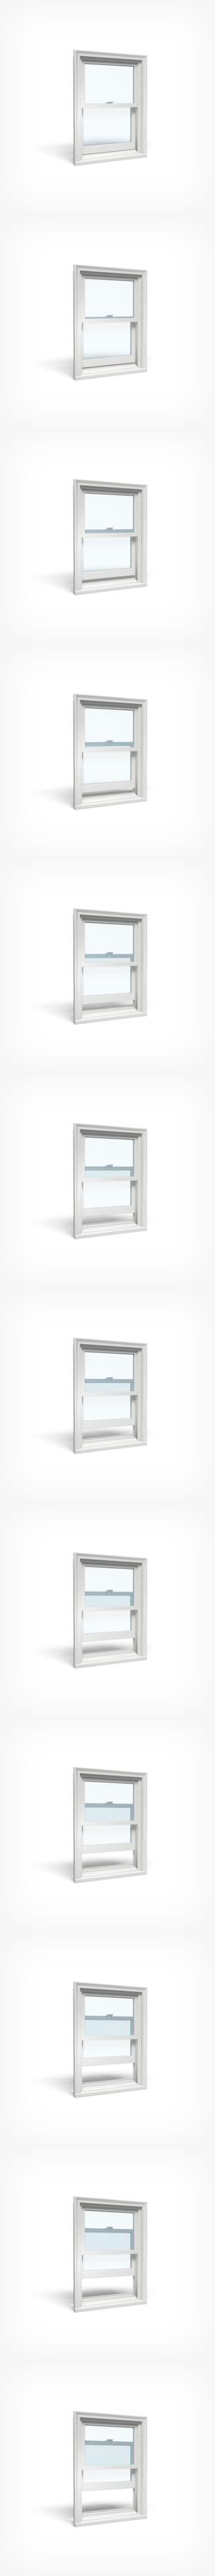 windows jeld wen windows doors. Black Bedroom Furniture Sets. Home Design Ideas